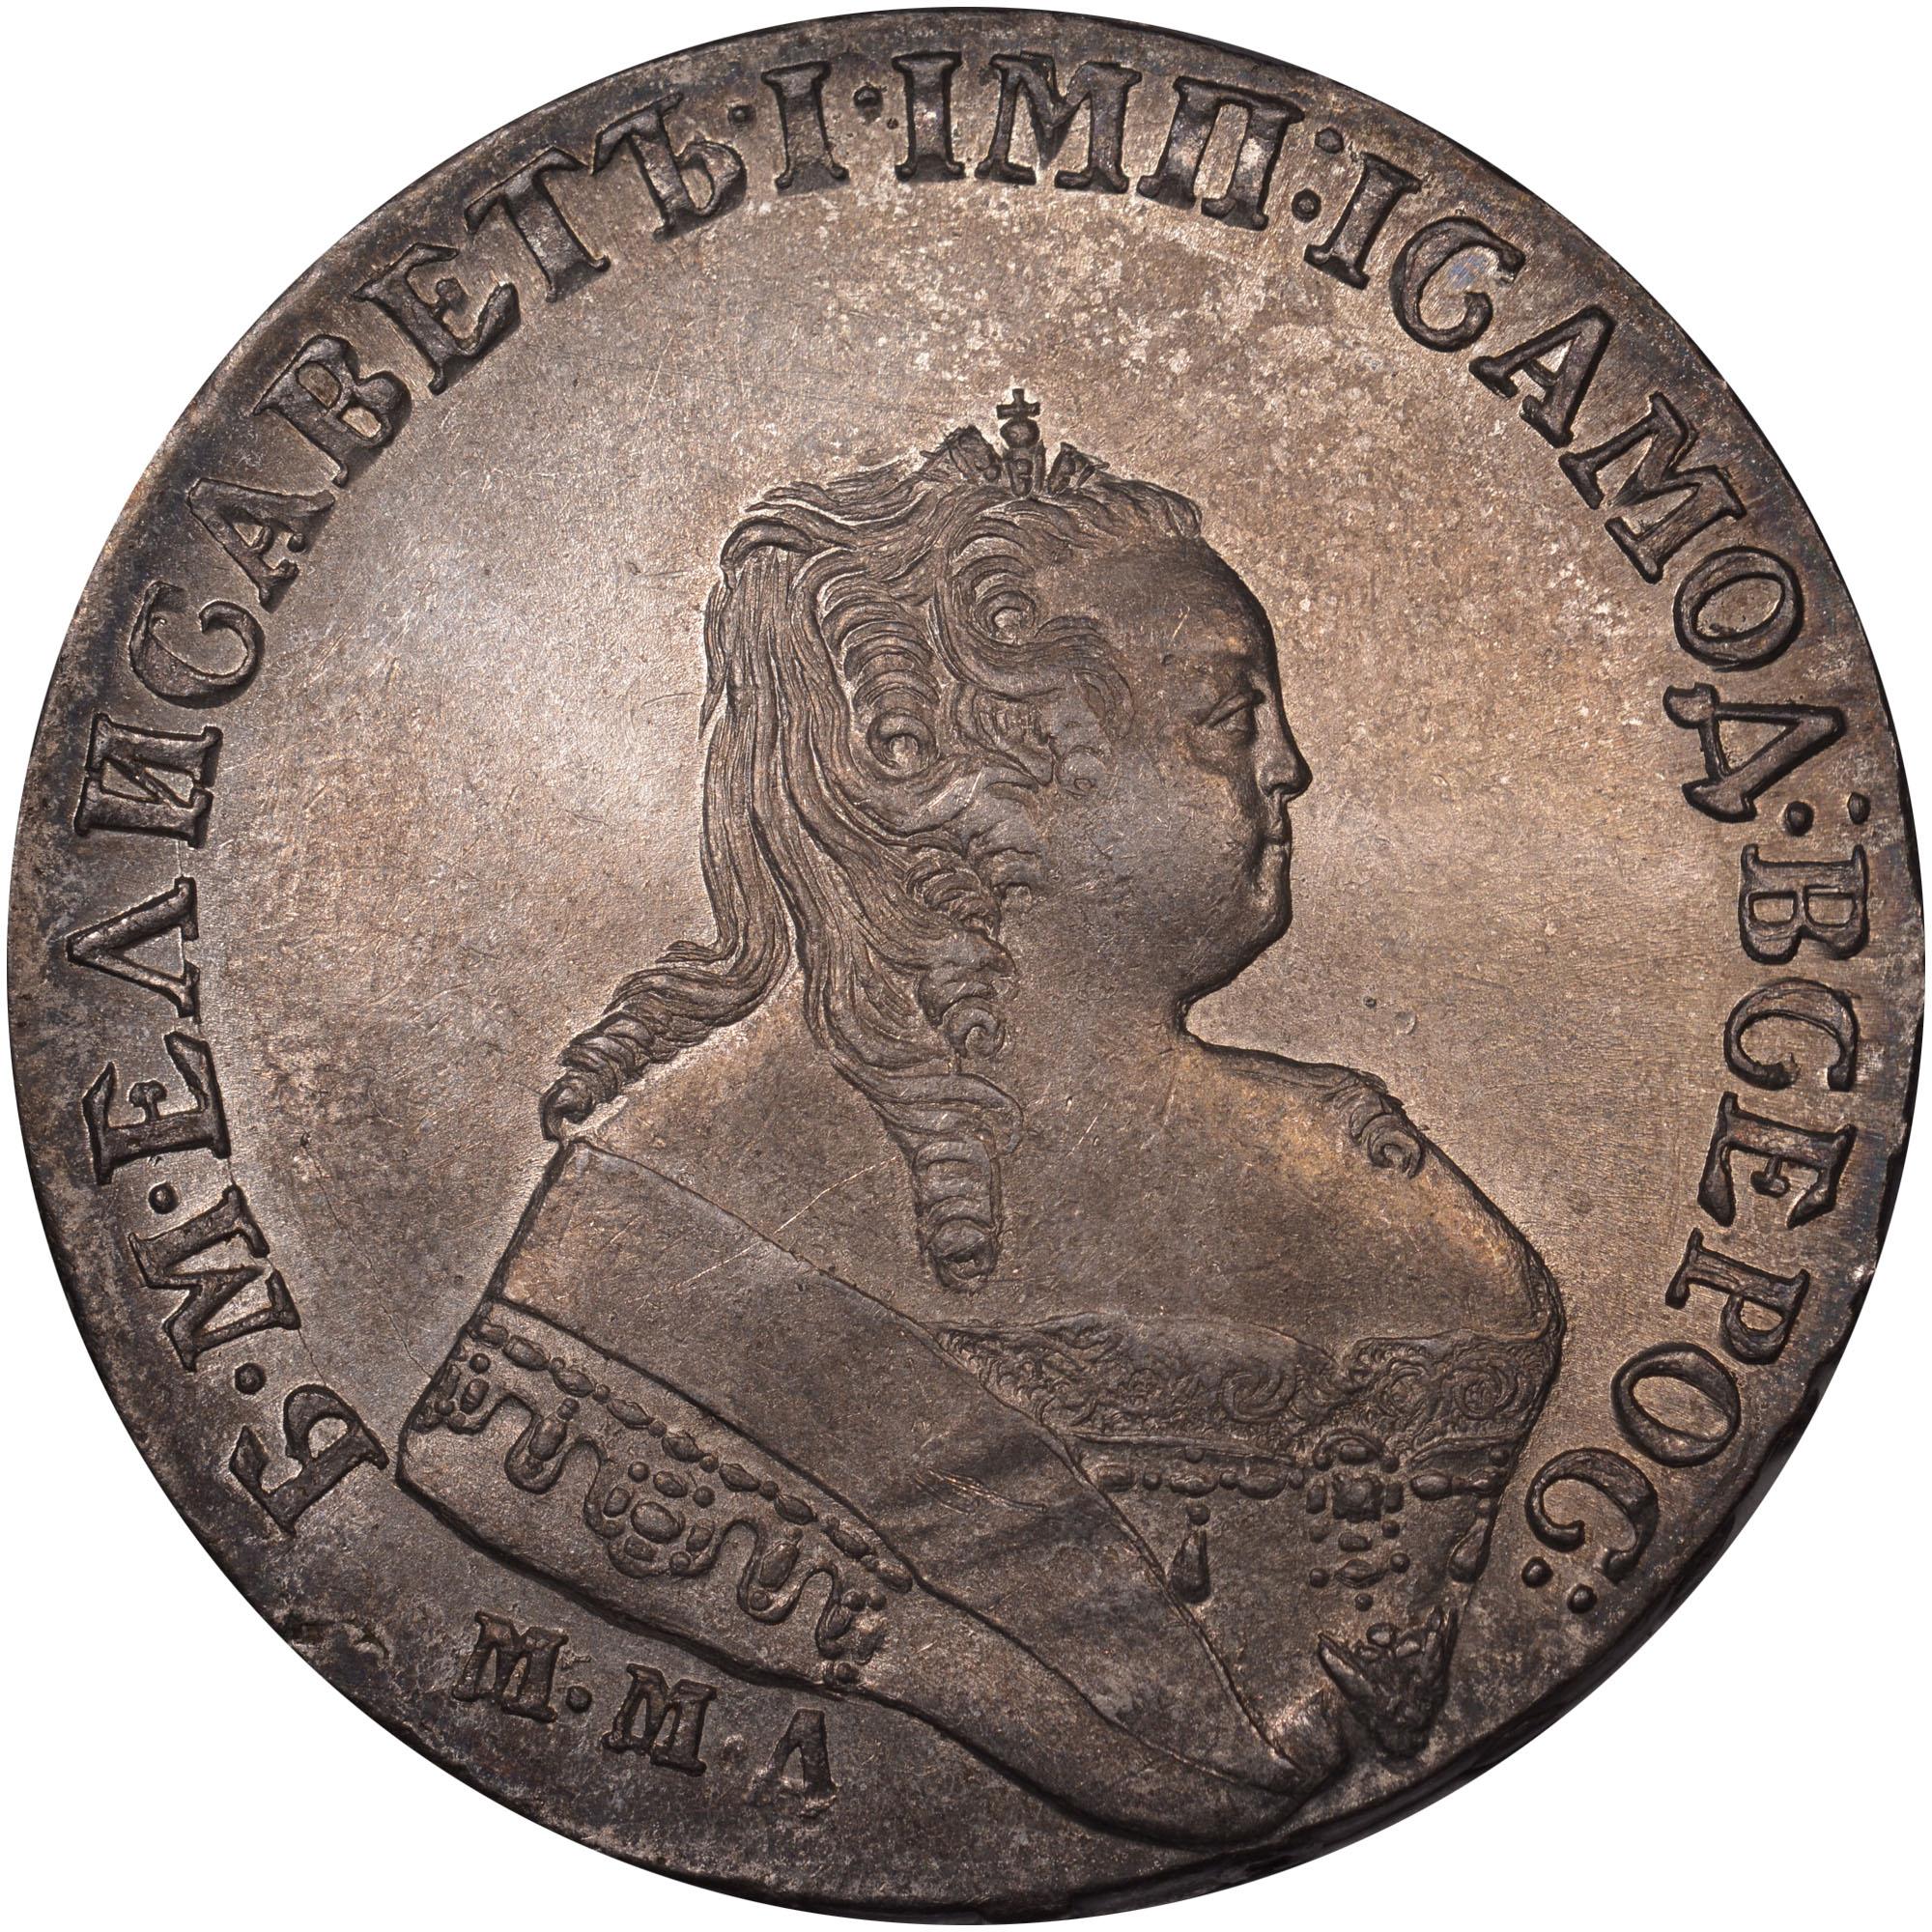 школах каталог монет империи фото с гуртом коже пастой плохо